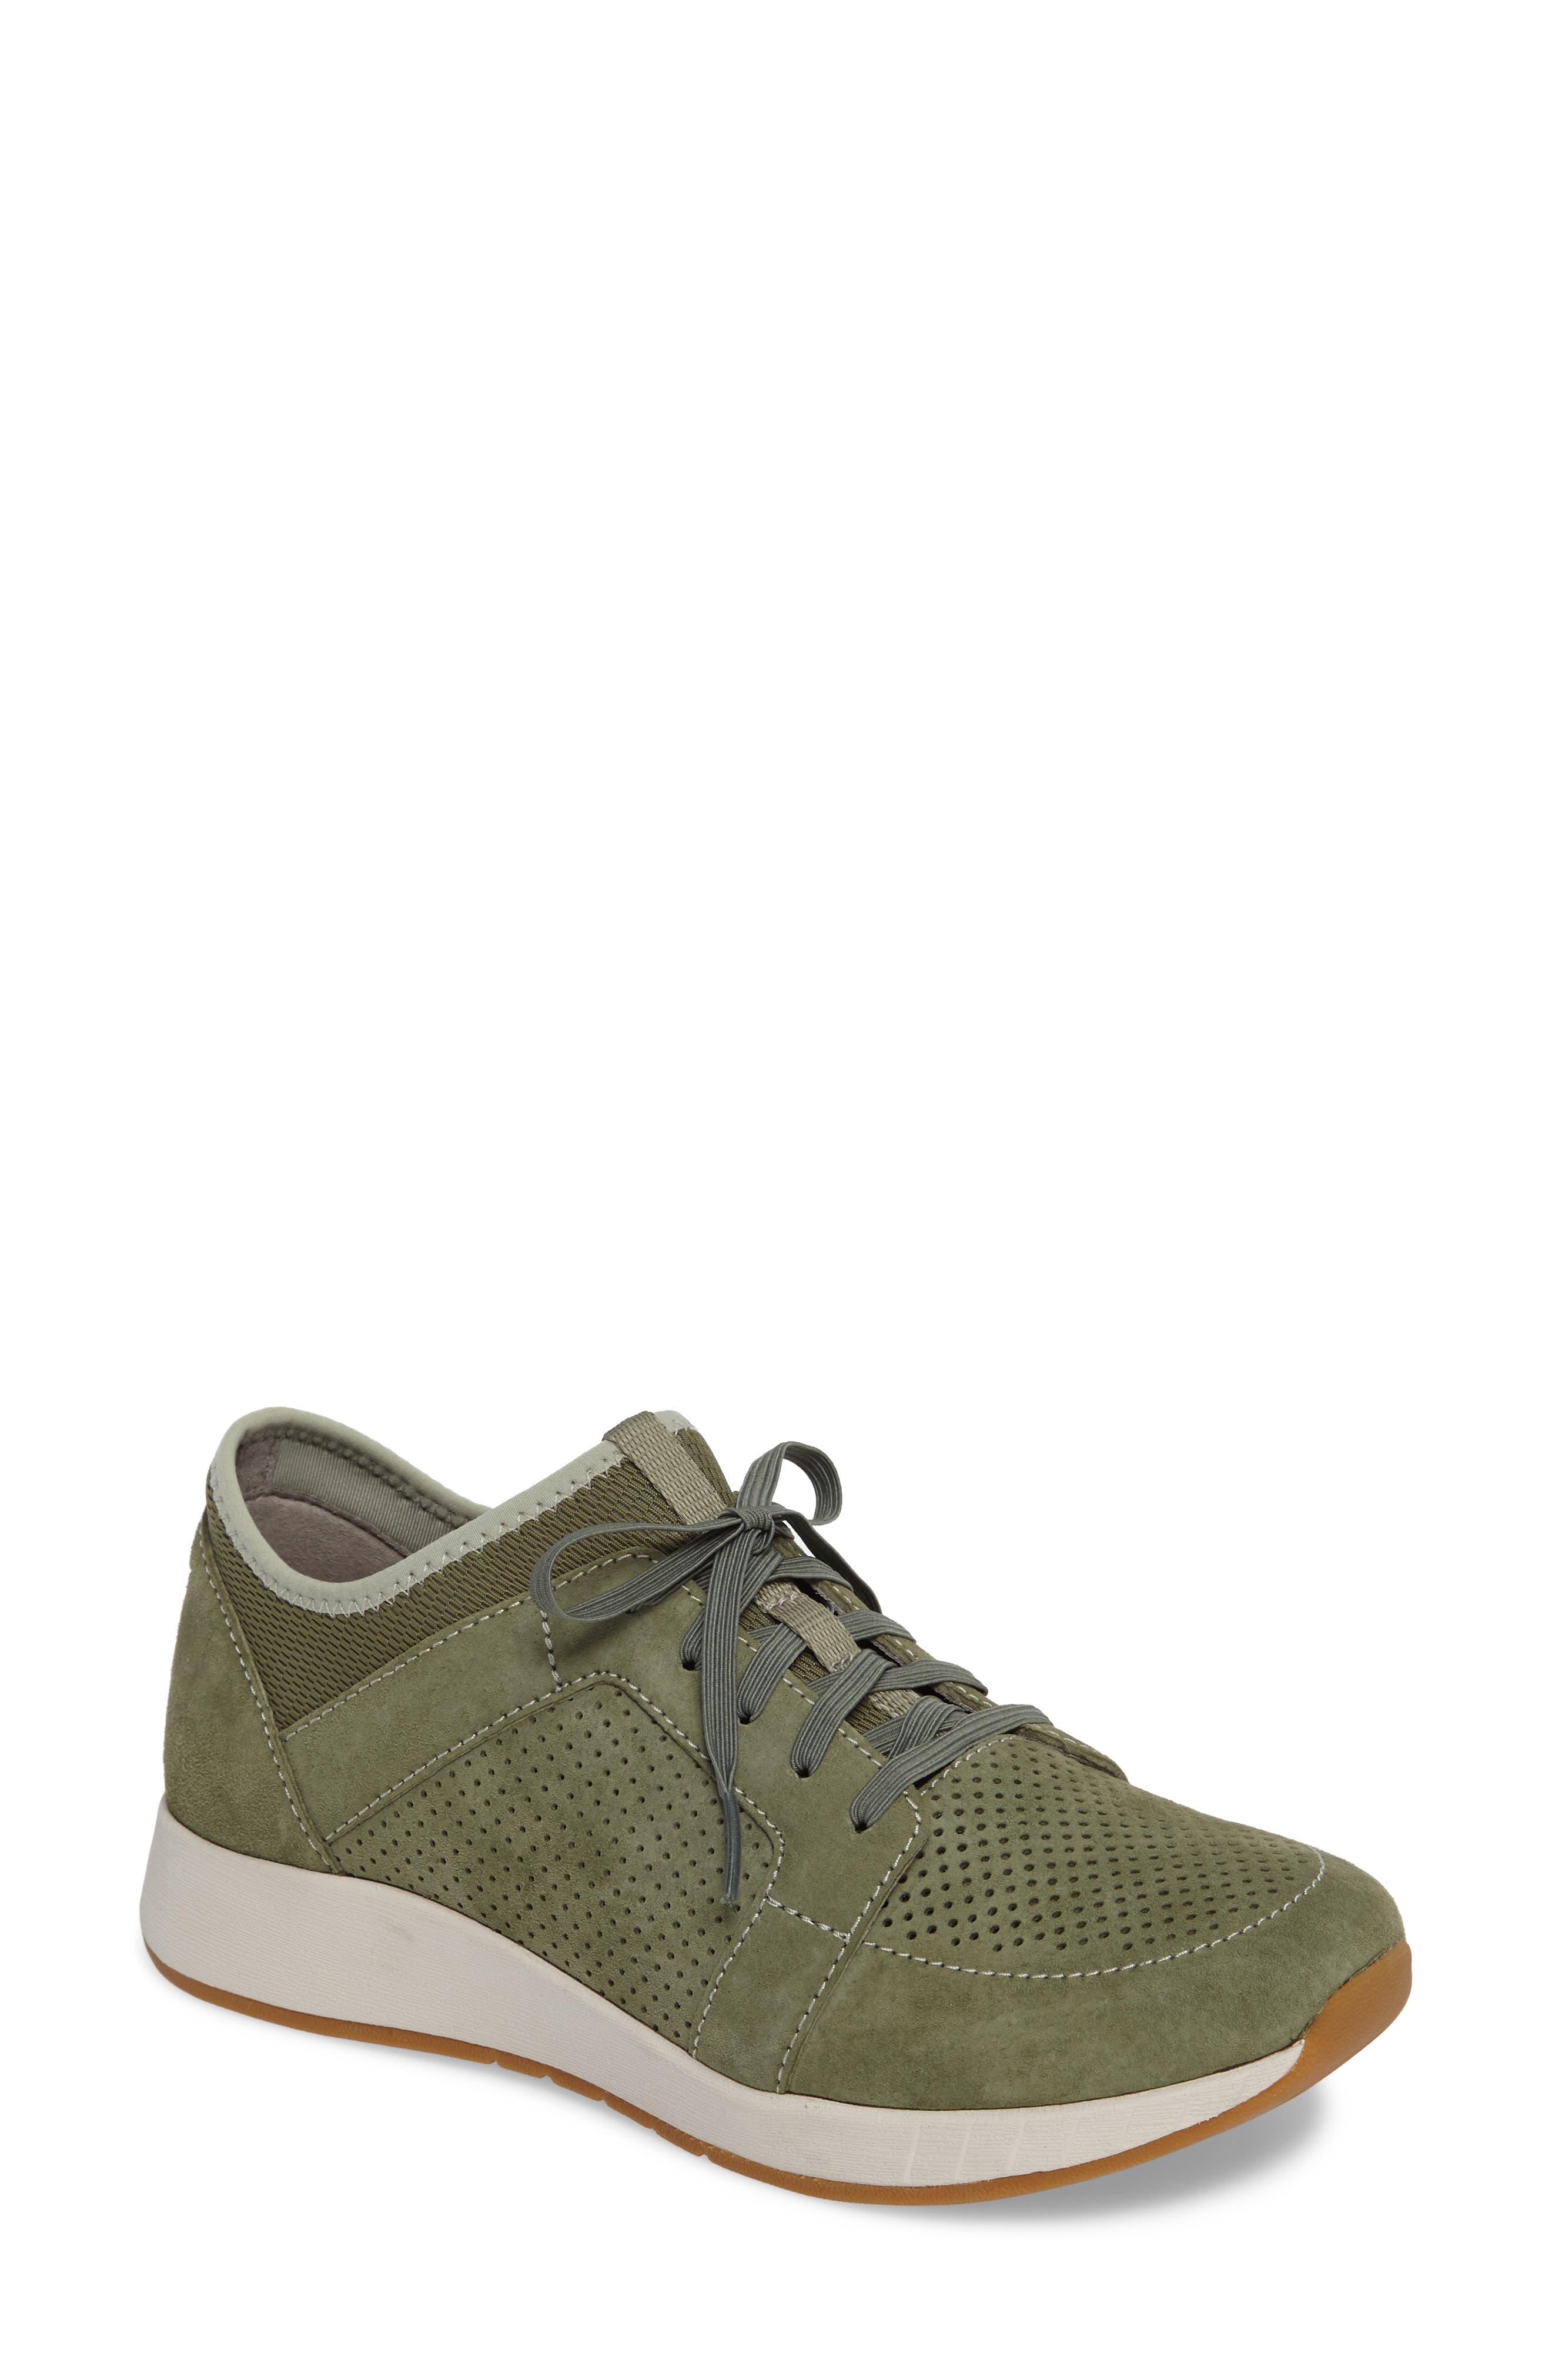 Cozette Slip-On Sneaker,                         Main,                         color, Sage Suede